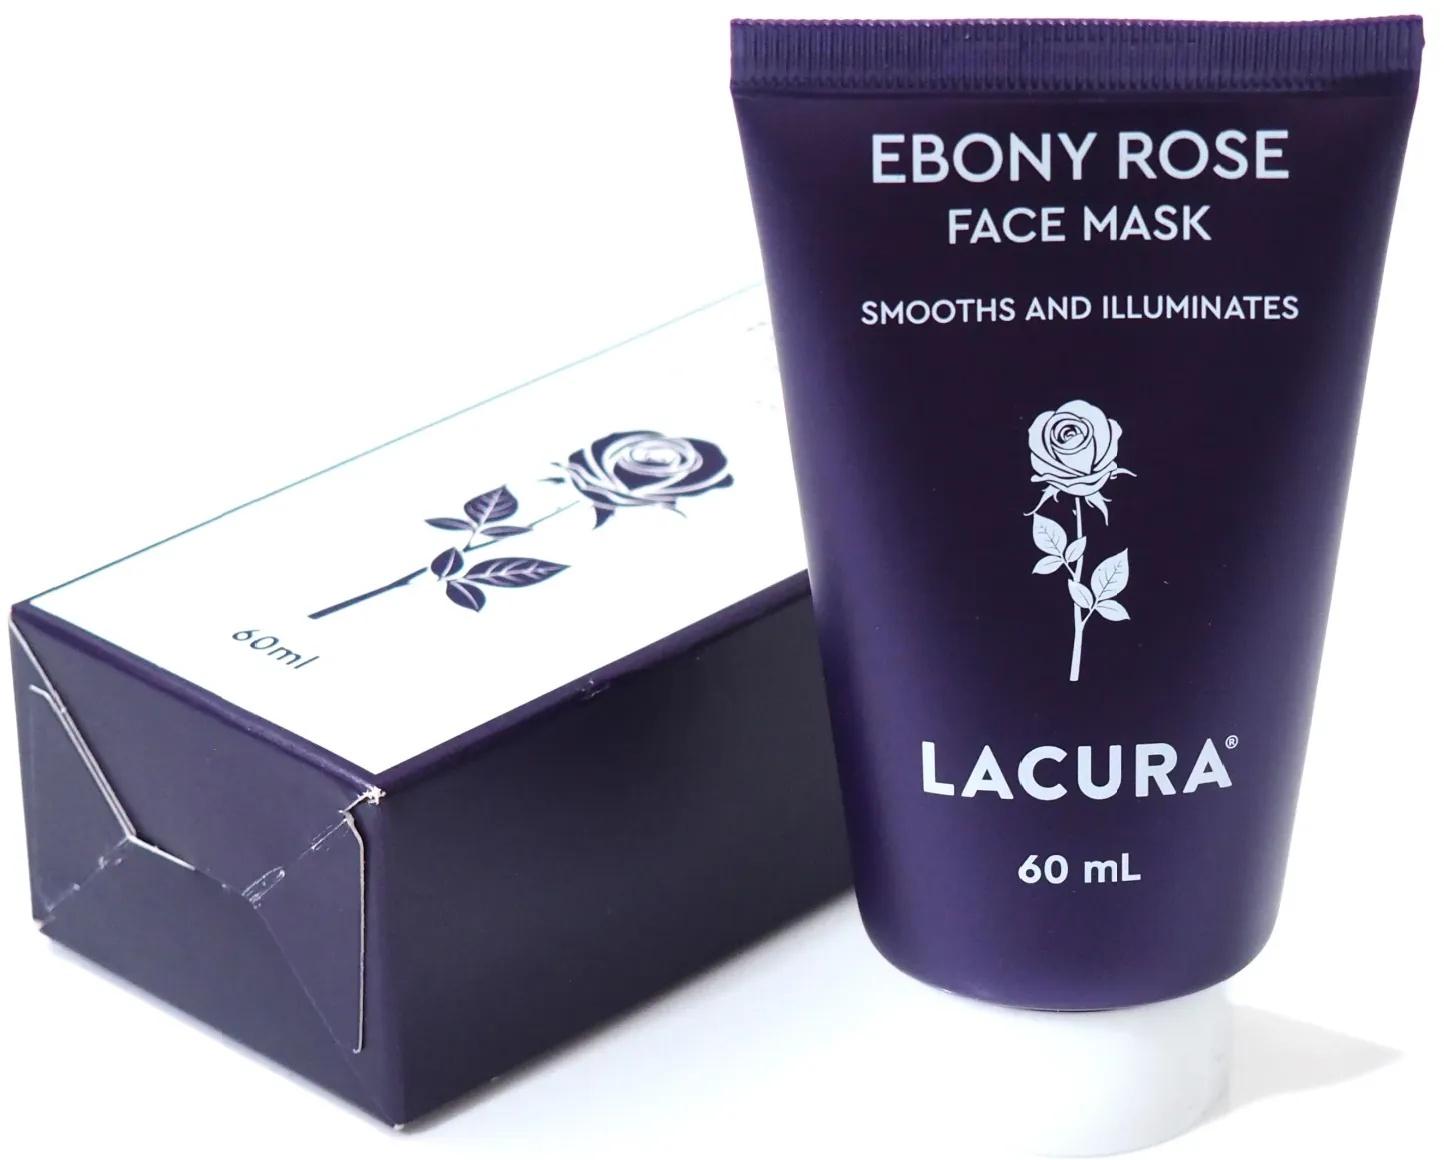 LACURA Ebony Rose Face Mask